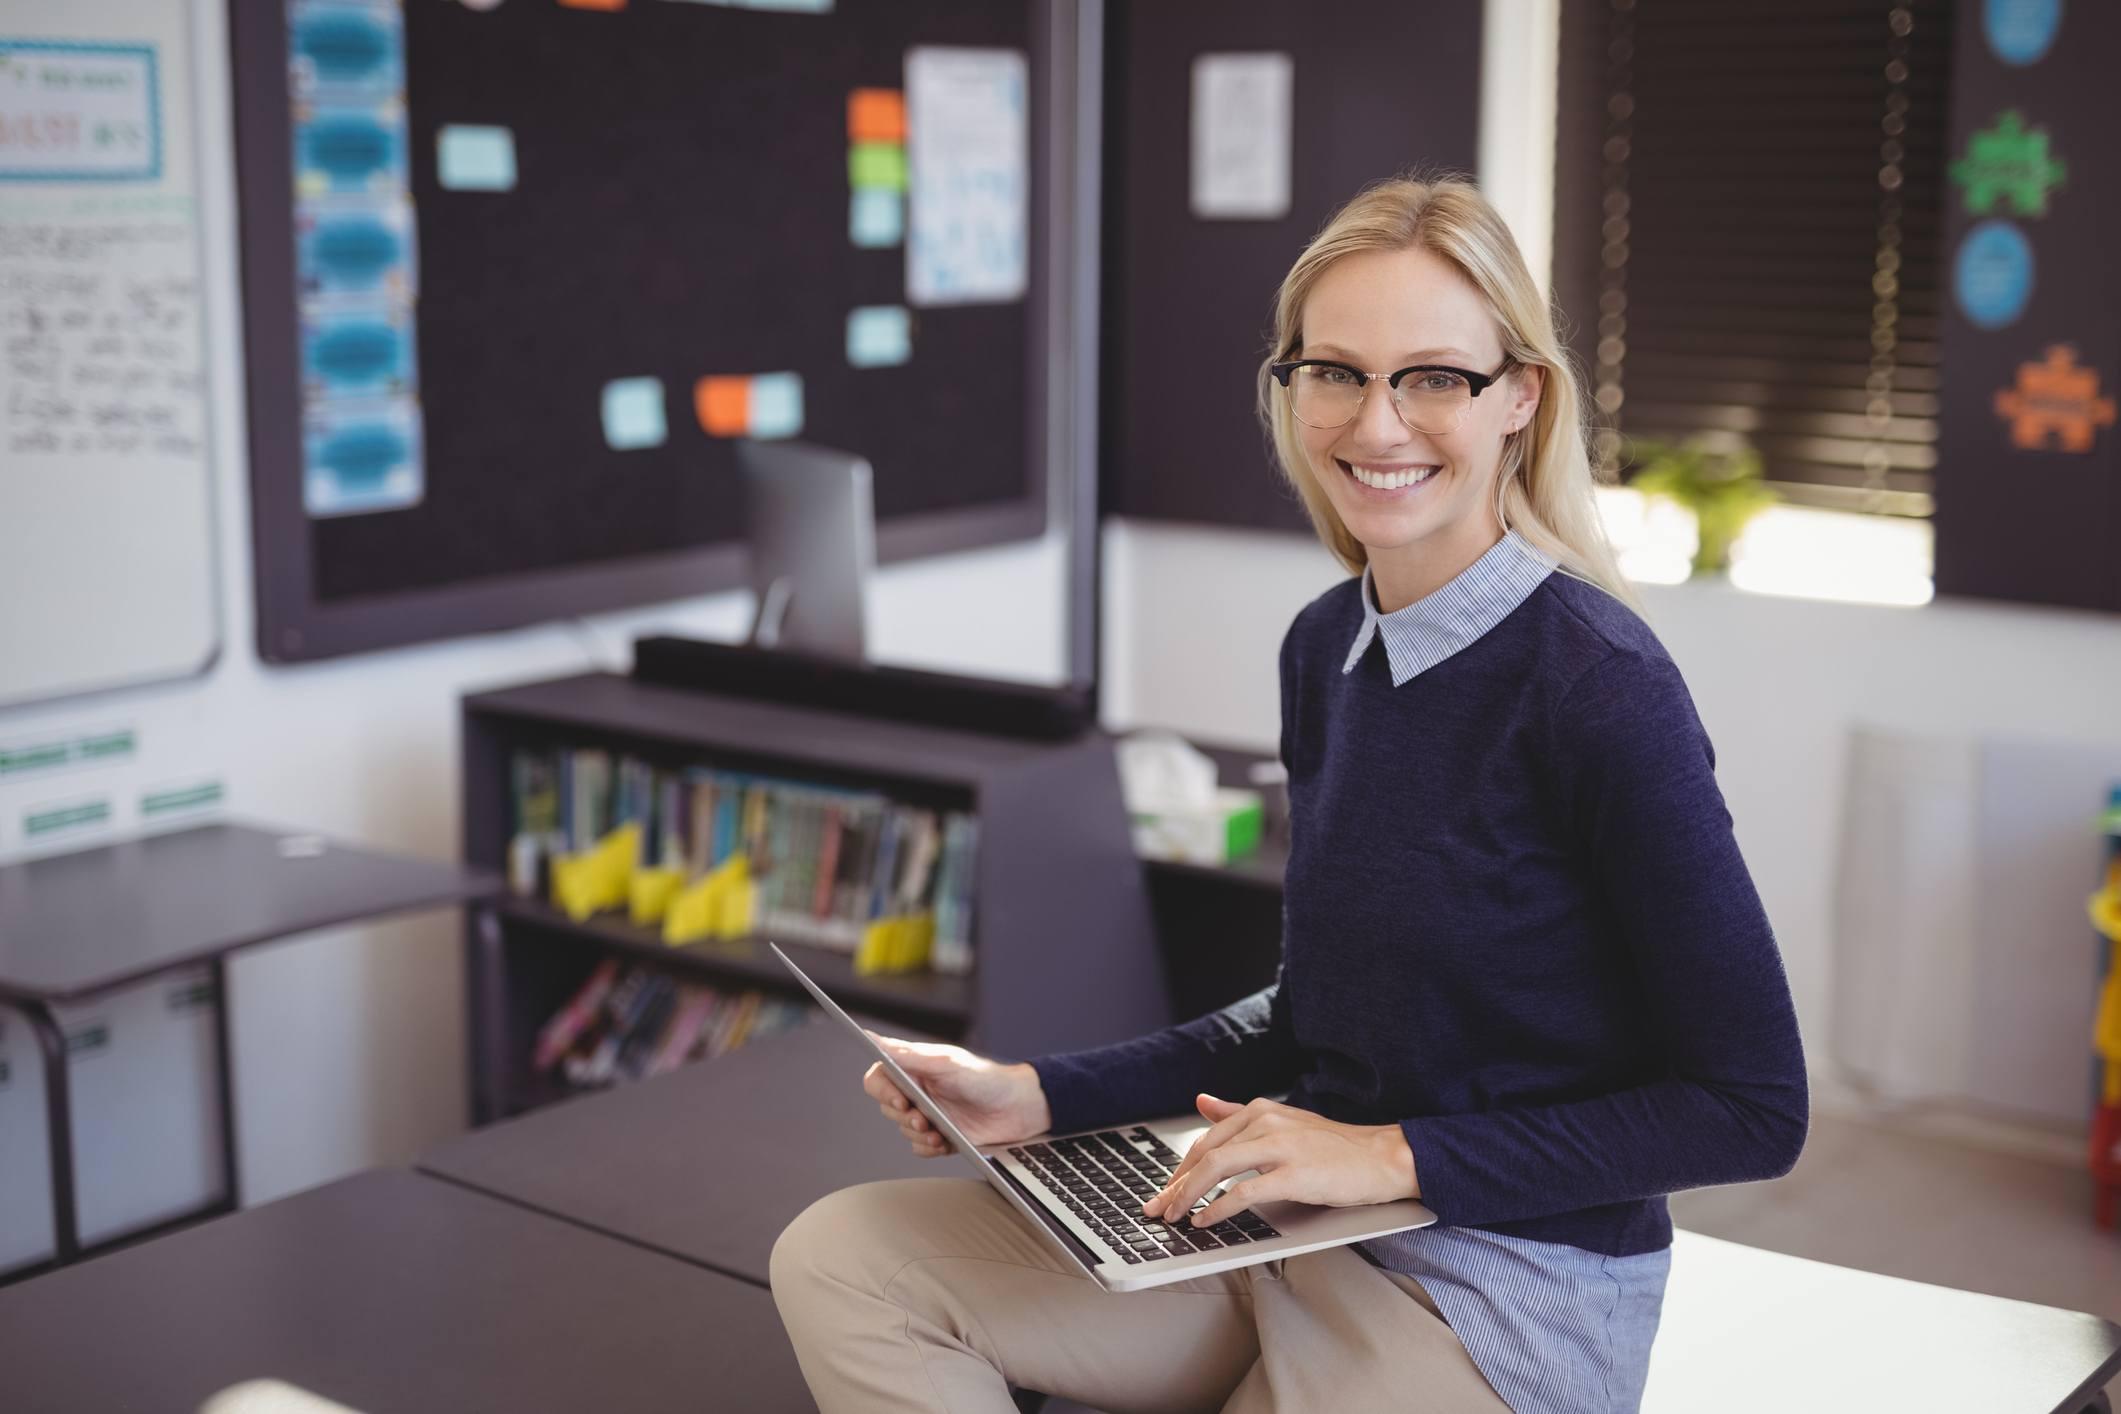 Portrait of happy teacher using laptop in classroom